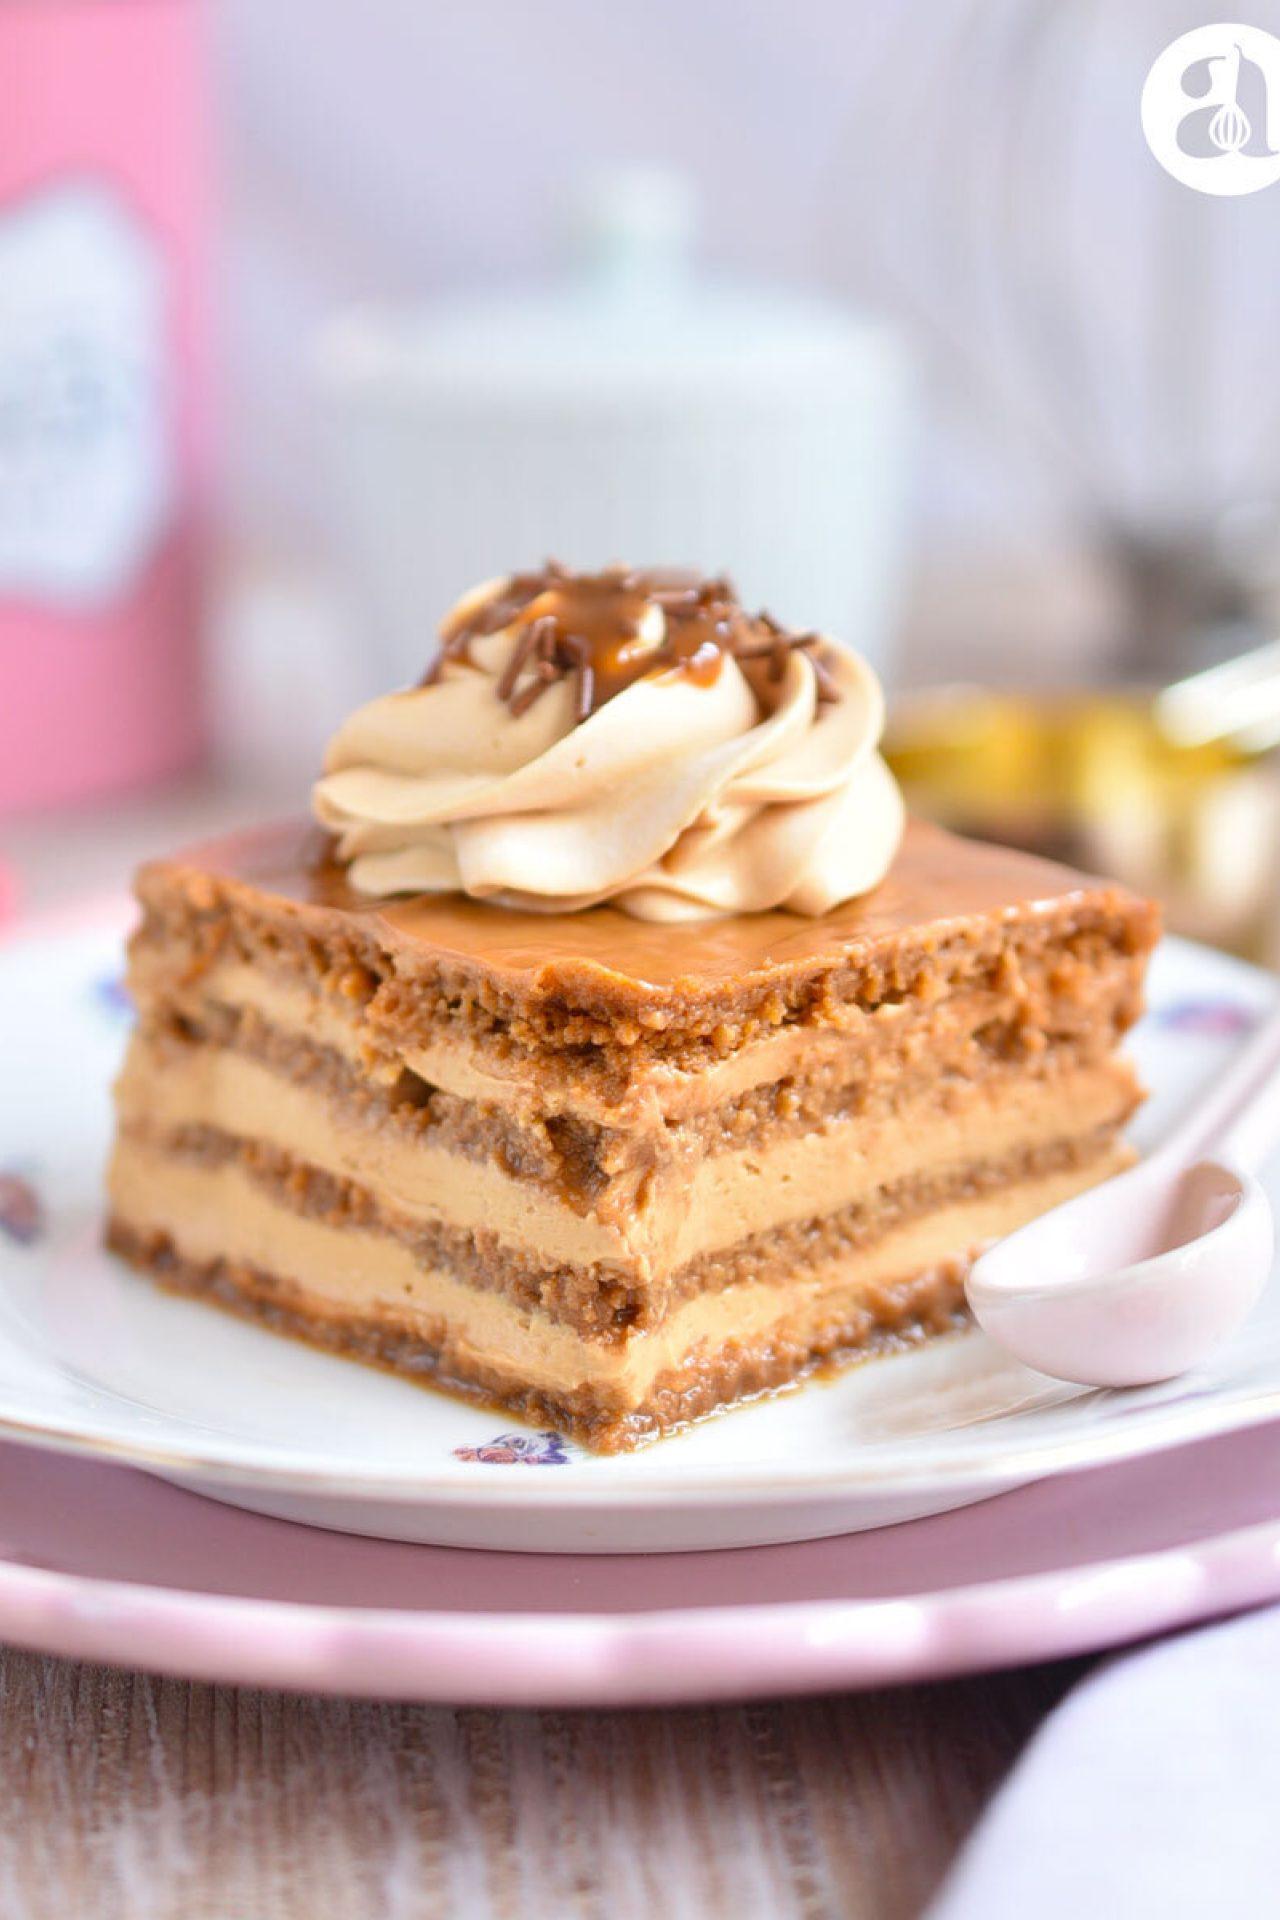 Marquesa de dulce de leche / arequipe / cajeta